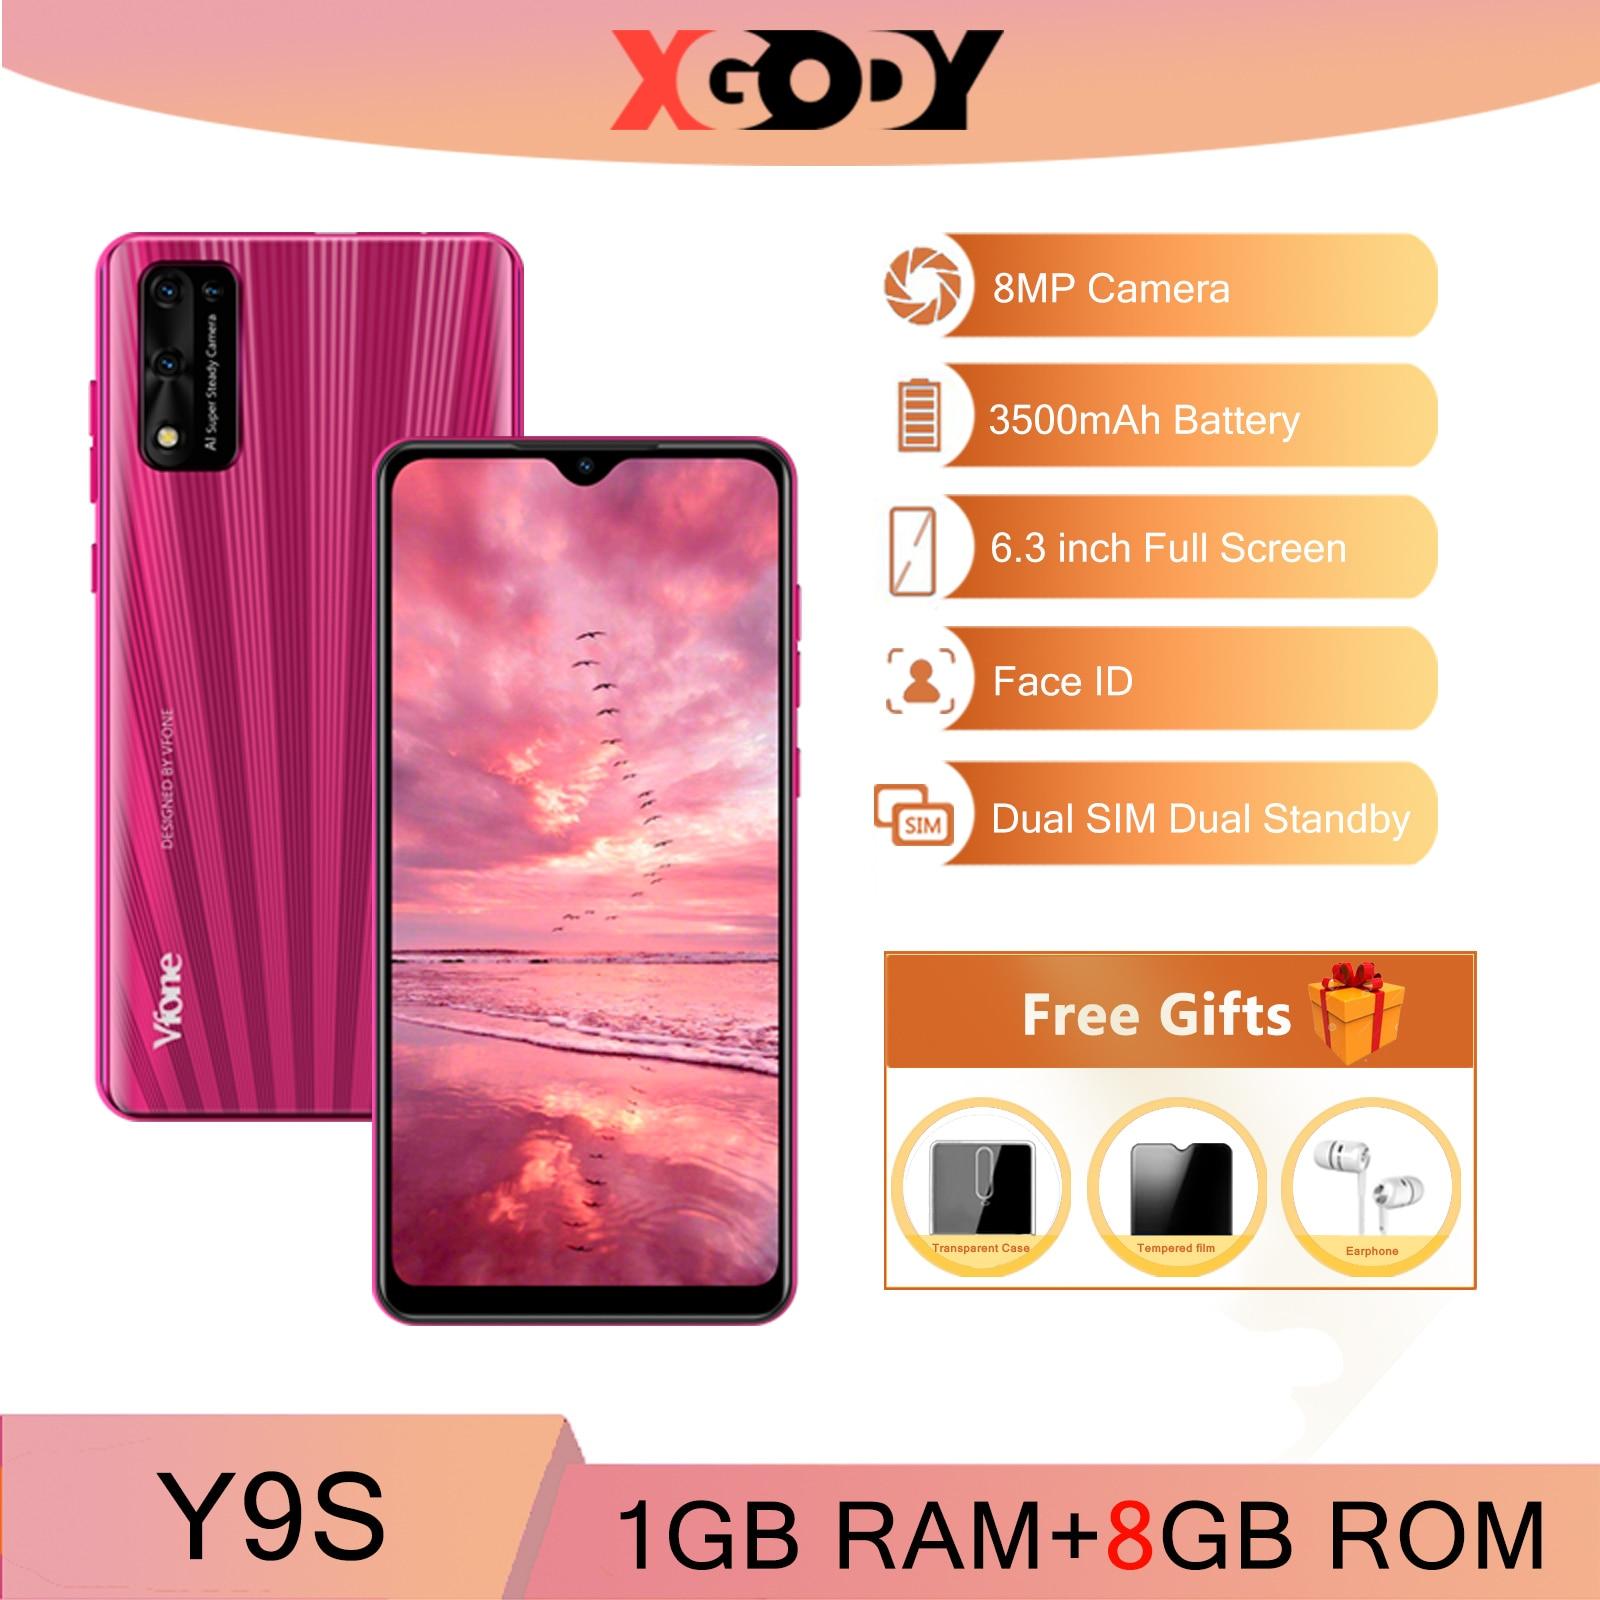 XGODY 3G smartphone 8MP Camera Android Mobile phones 1GB 8GB 3500mAh 6.3'' Cellphone Unlock 19:9 Dual SIM Face ID WiFi GPS Y9s